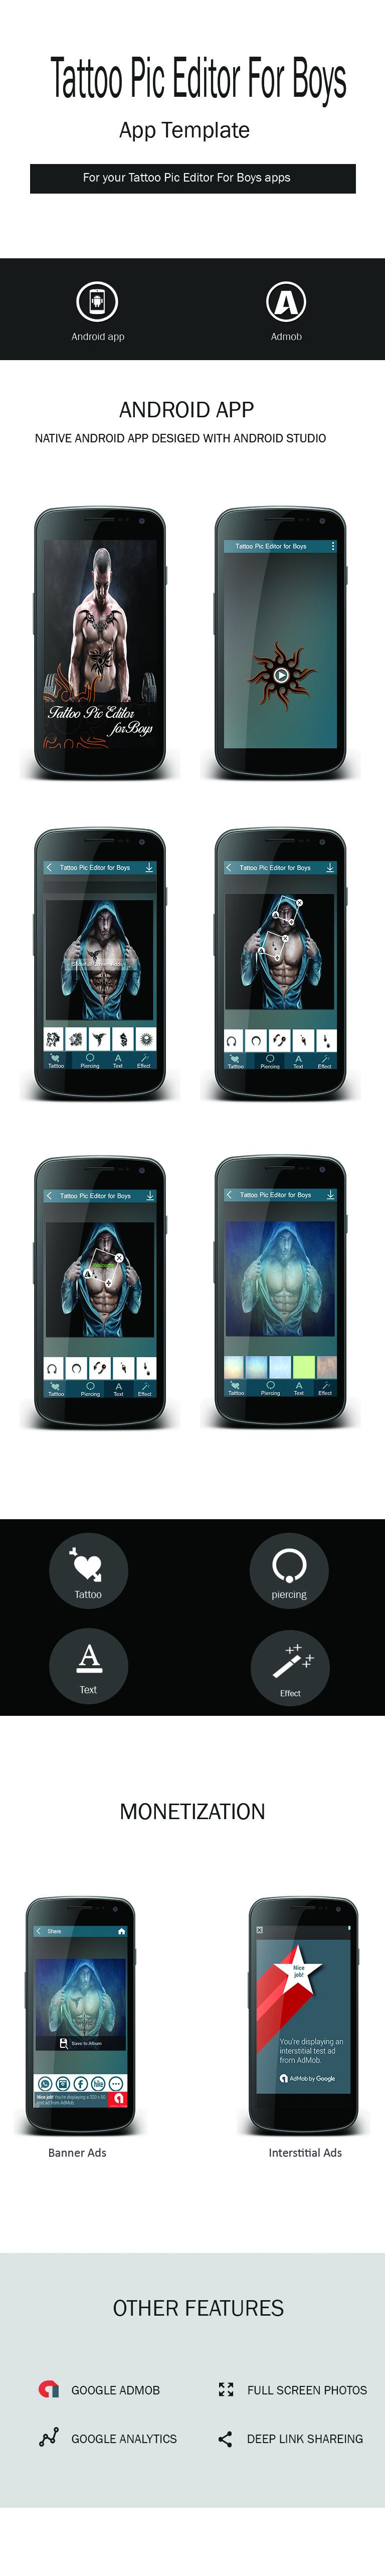 Tattoo Pic Editor for Boys (Photo Editing App) - 1